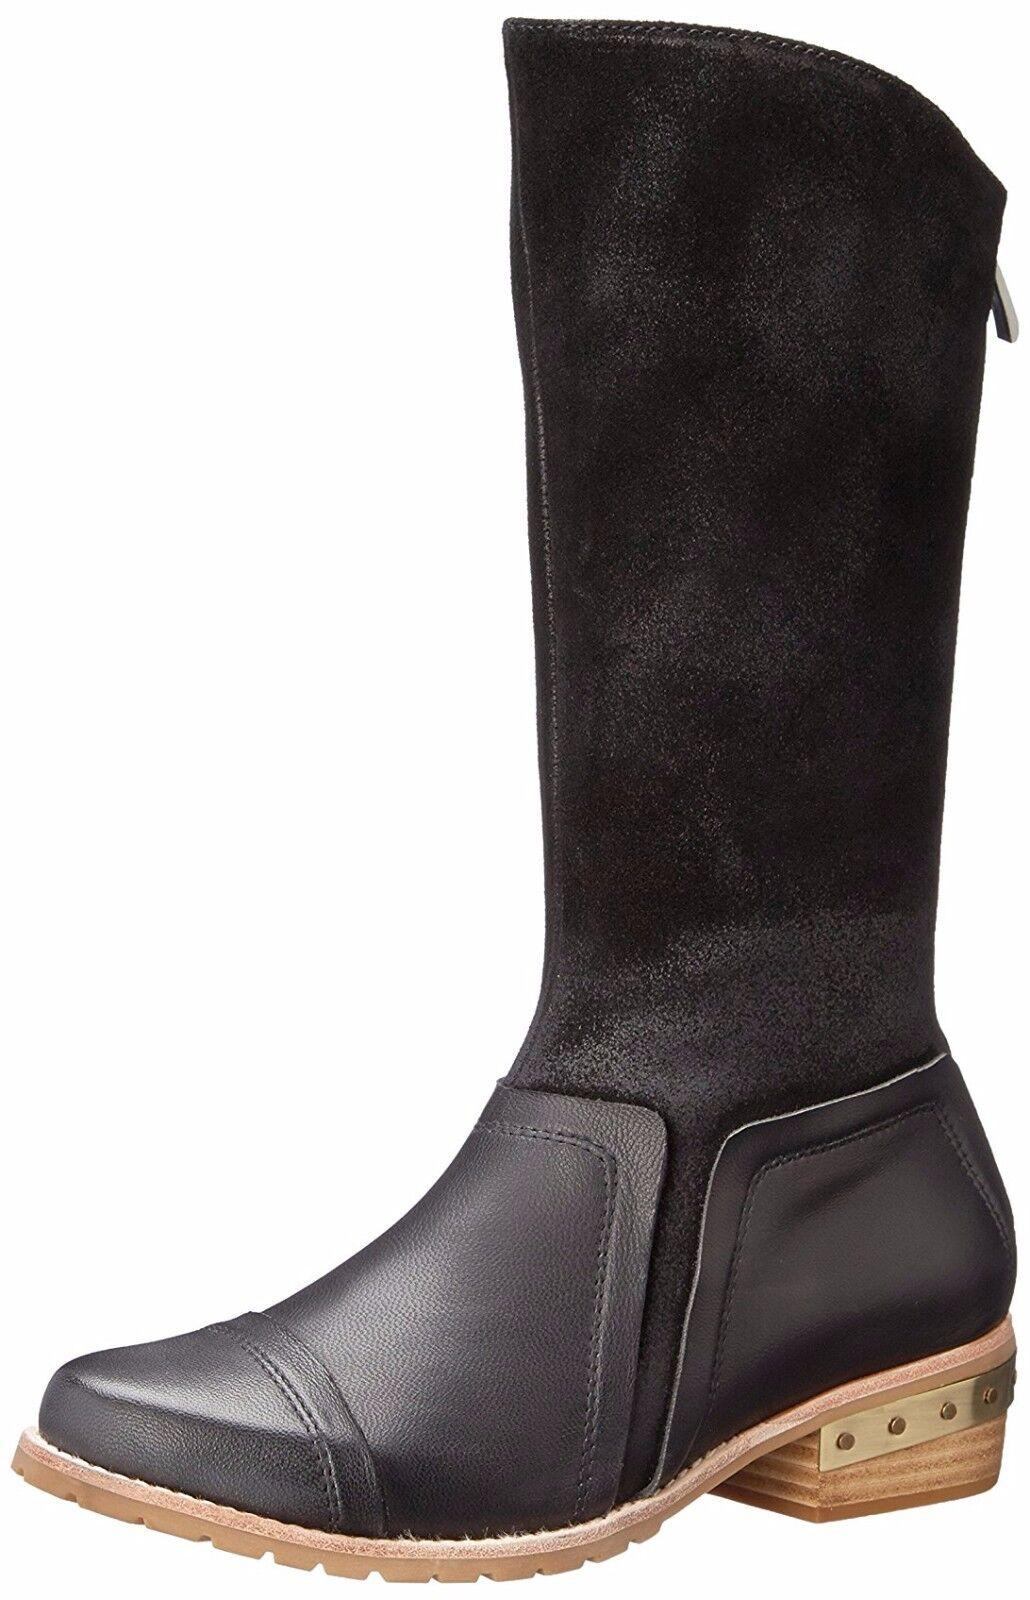 ANTELOPE SHOES RUFF BOOTIES 475 MID CALF CLOG CLOG CLOG BOOTS BLACK BACK ZIP 7.5  279 7d8b50